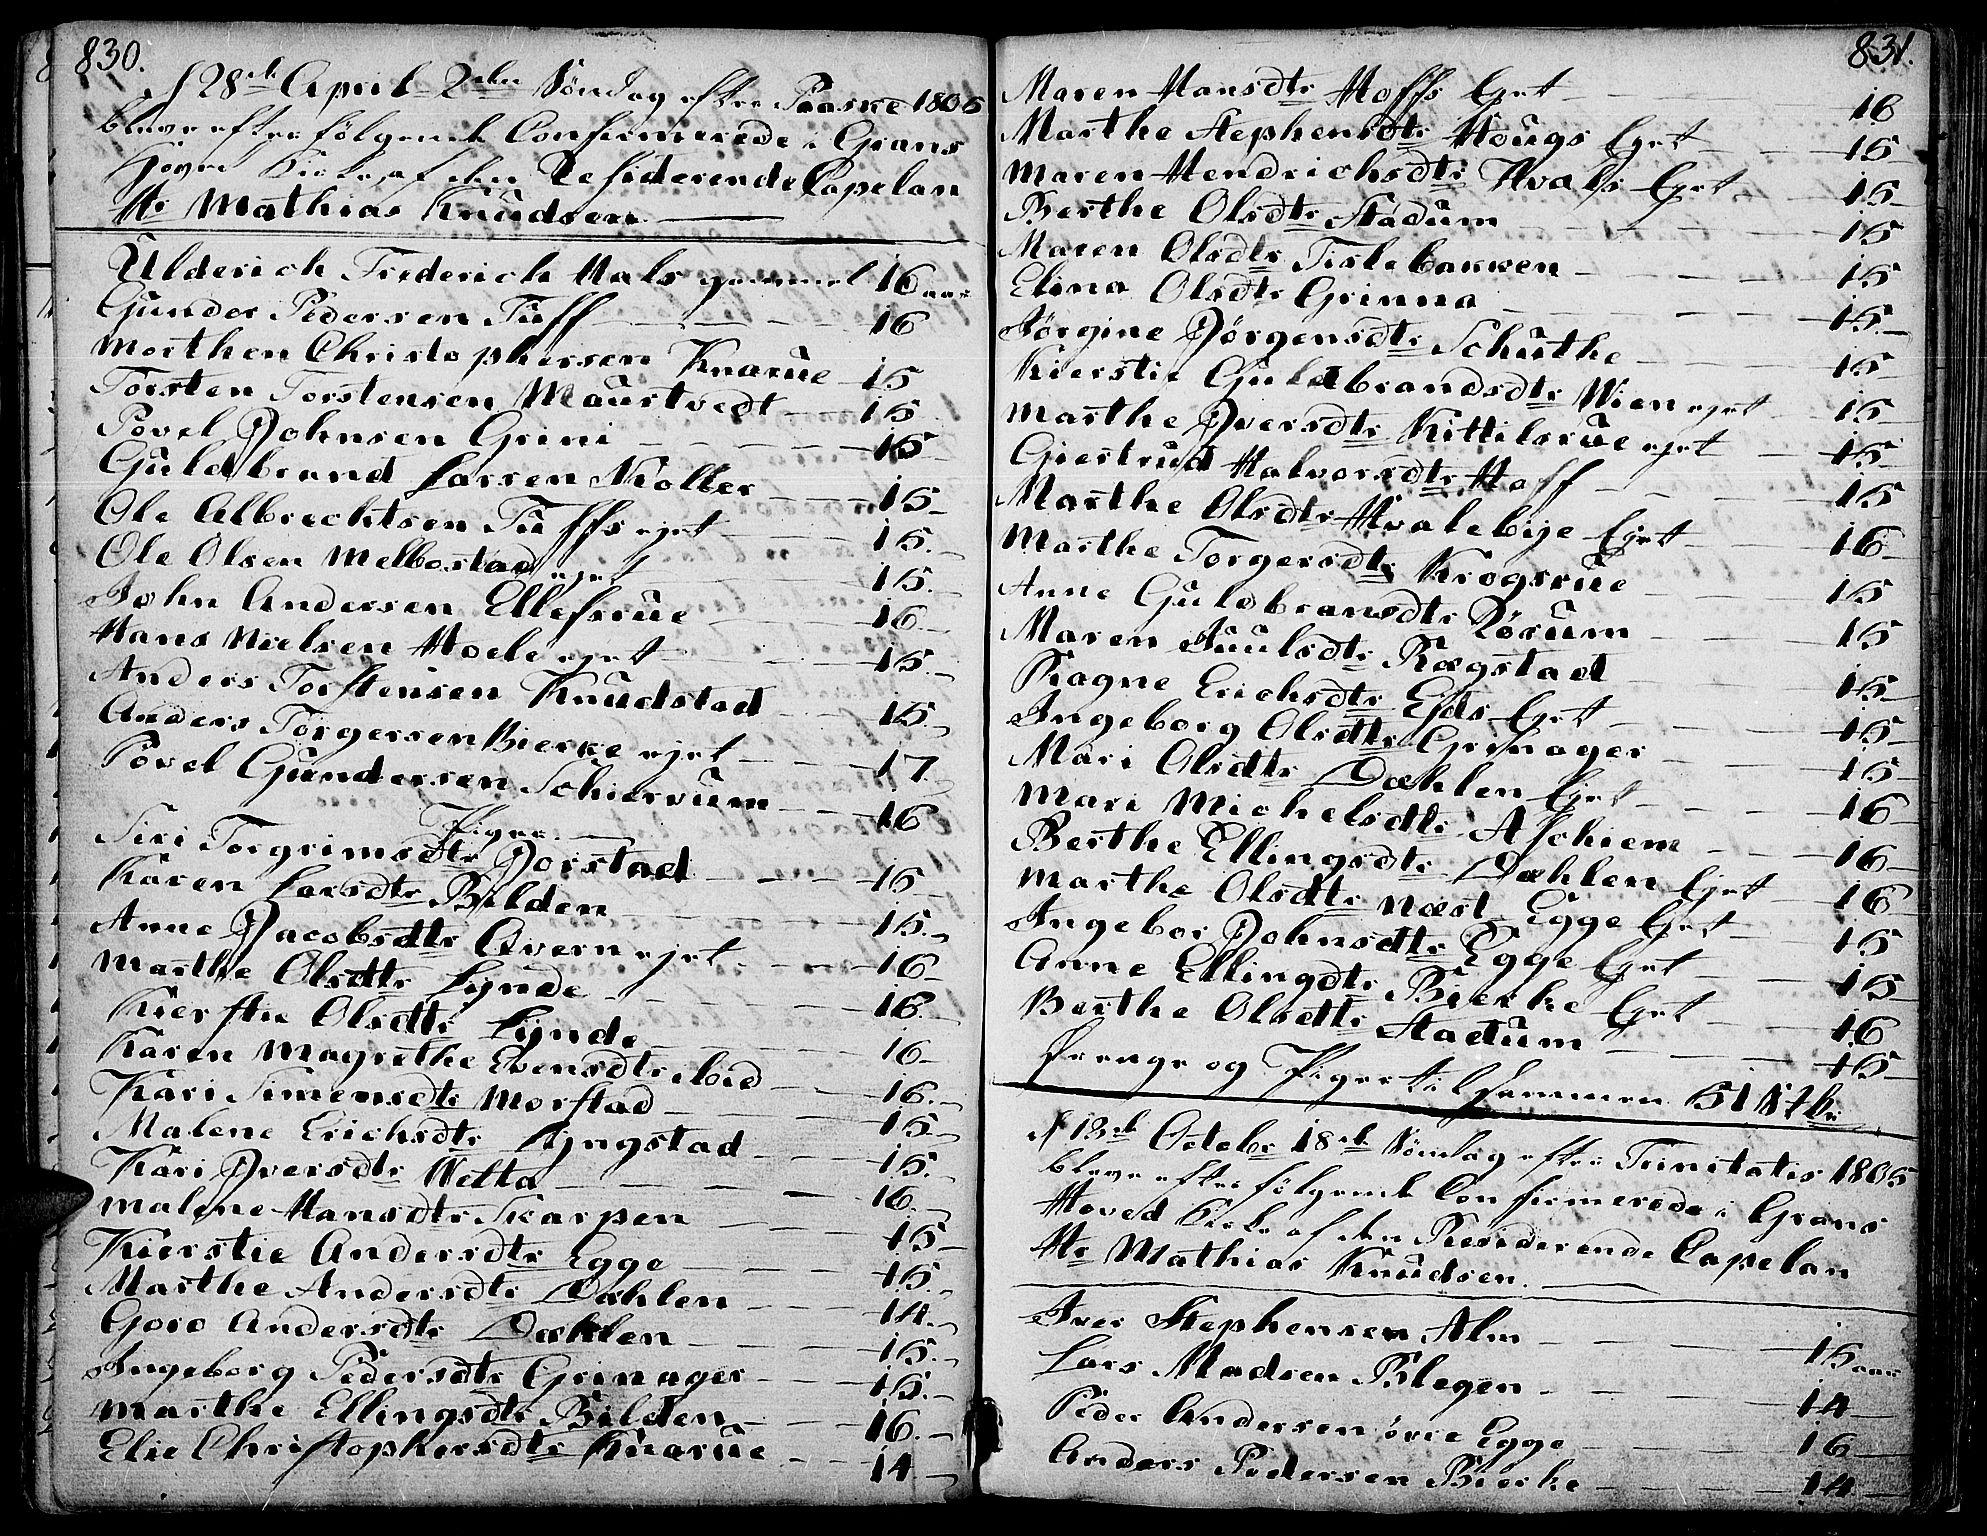 SAH, Gran prestekontor, Ministerialbok nr. 6, 1787-1824, s. 830-831